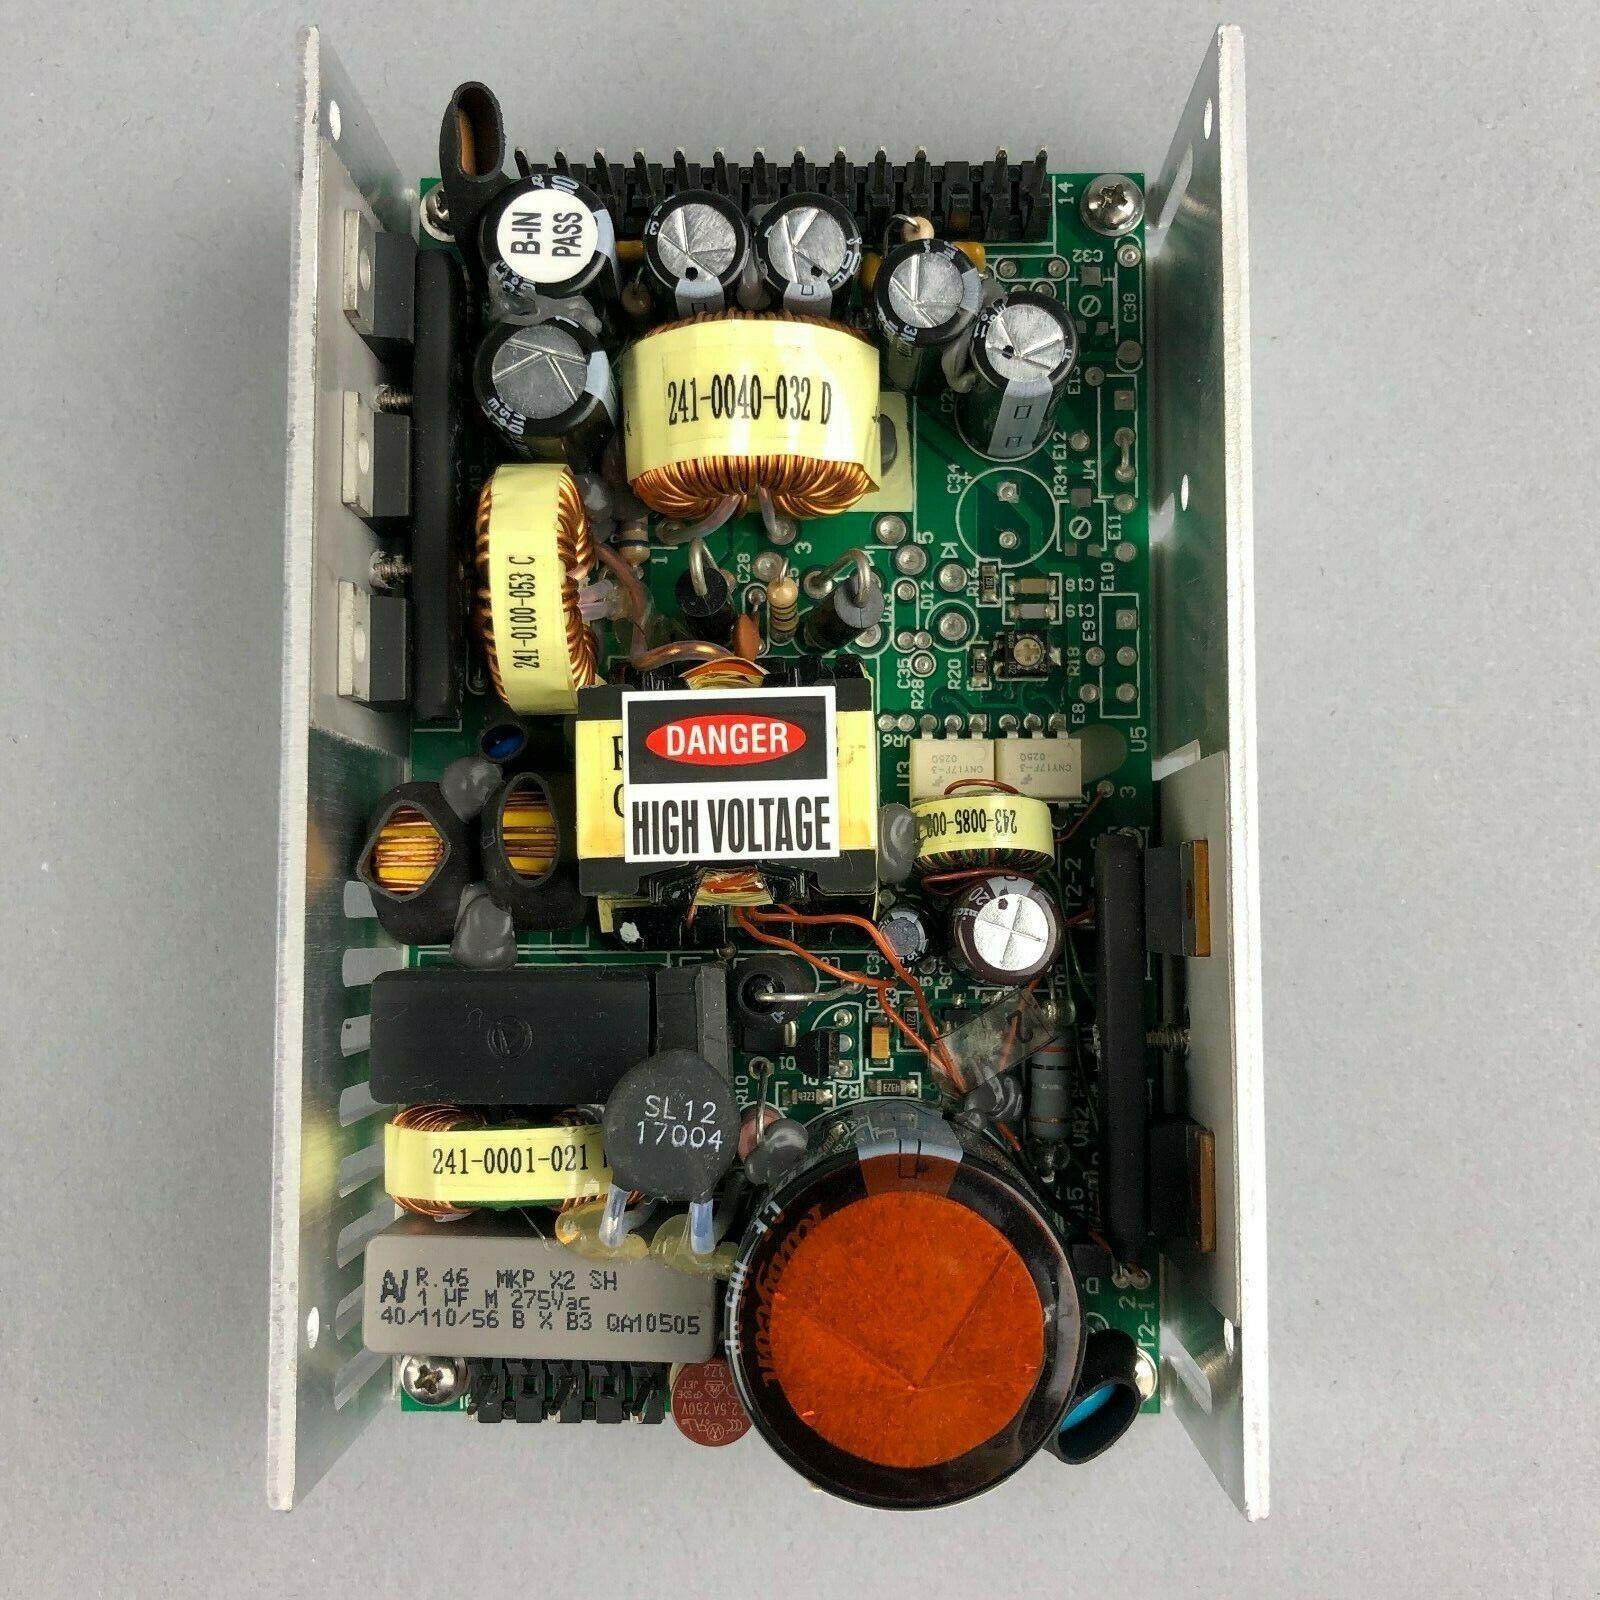 DIGITAL POWER Model   US100-301 Power Supply Input 90-250VAC, 47-63Hz, 2.5A